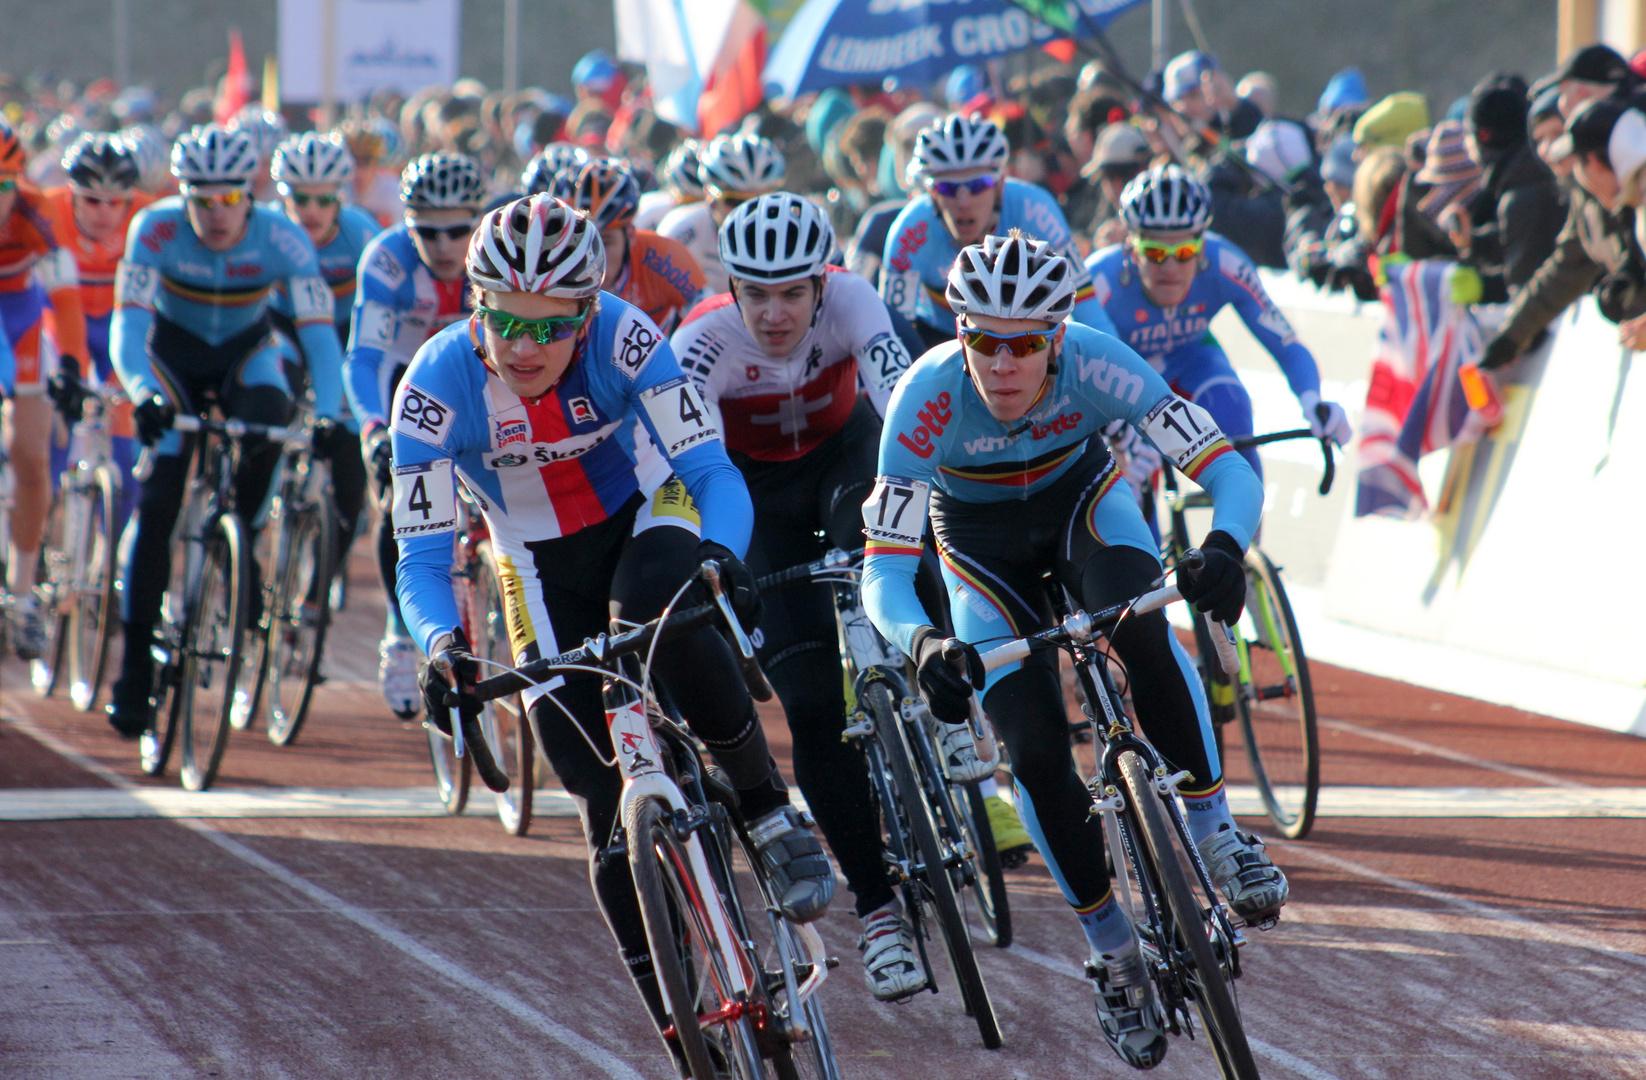 Radcross-WM St. Wendel 2